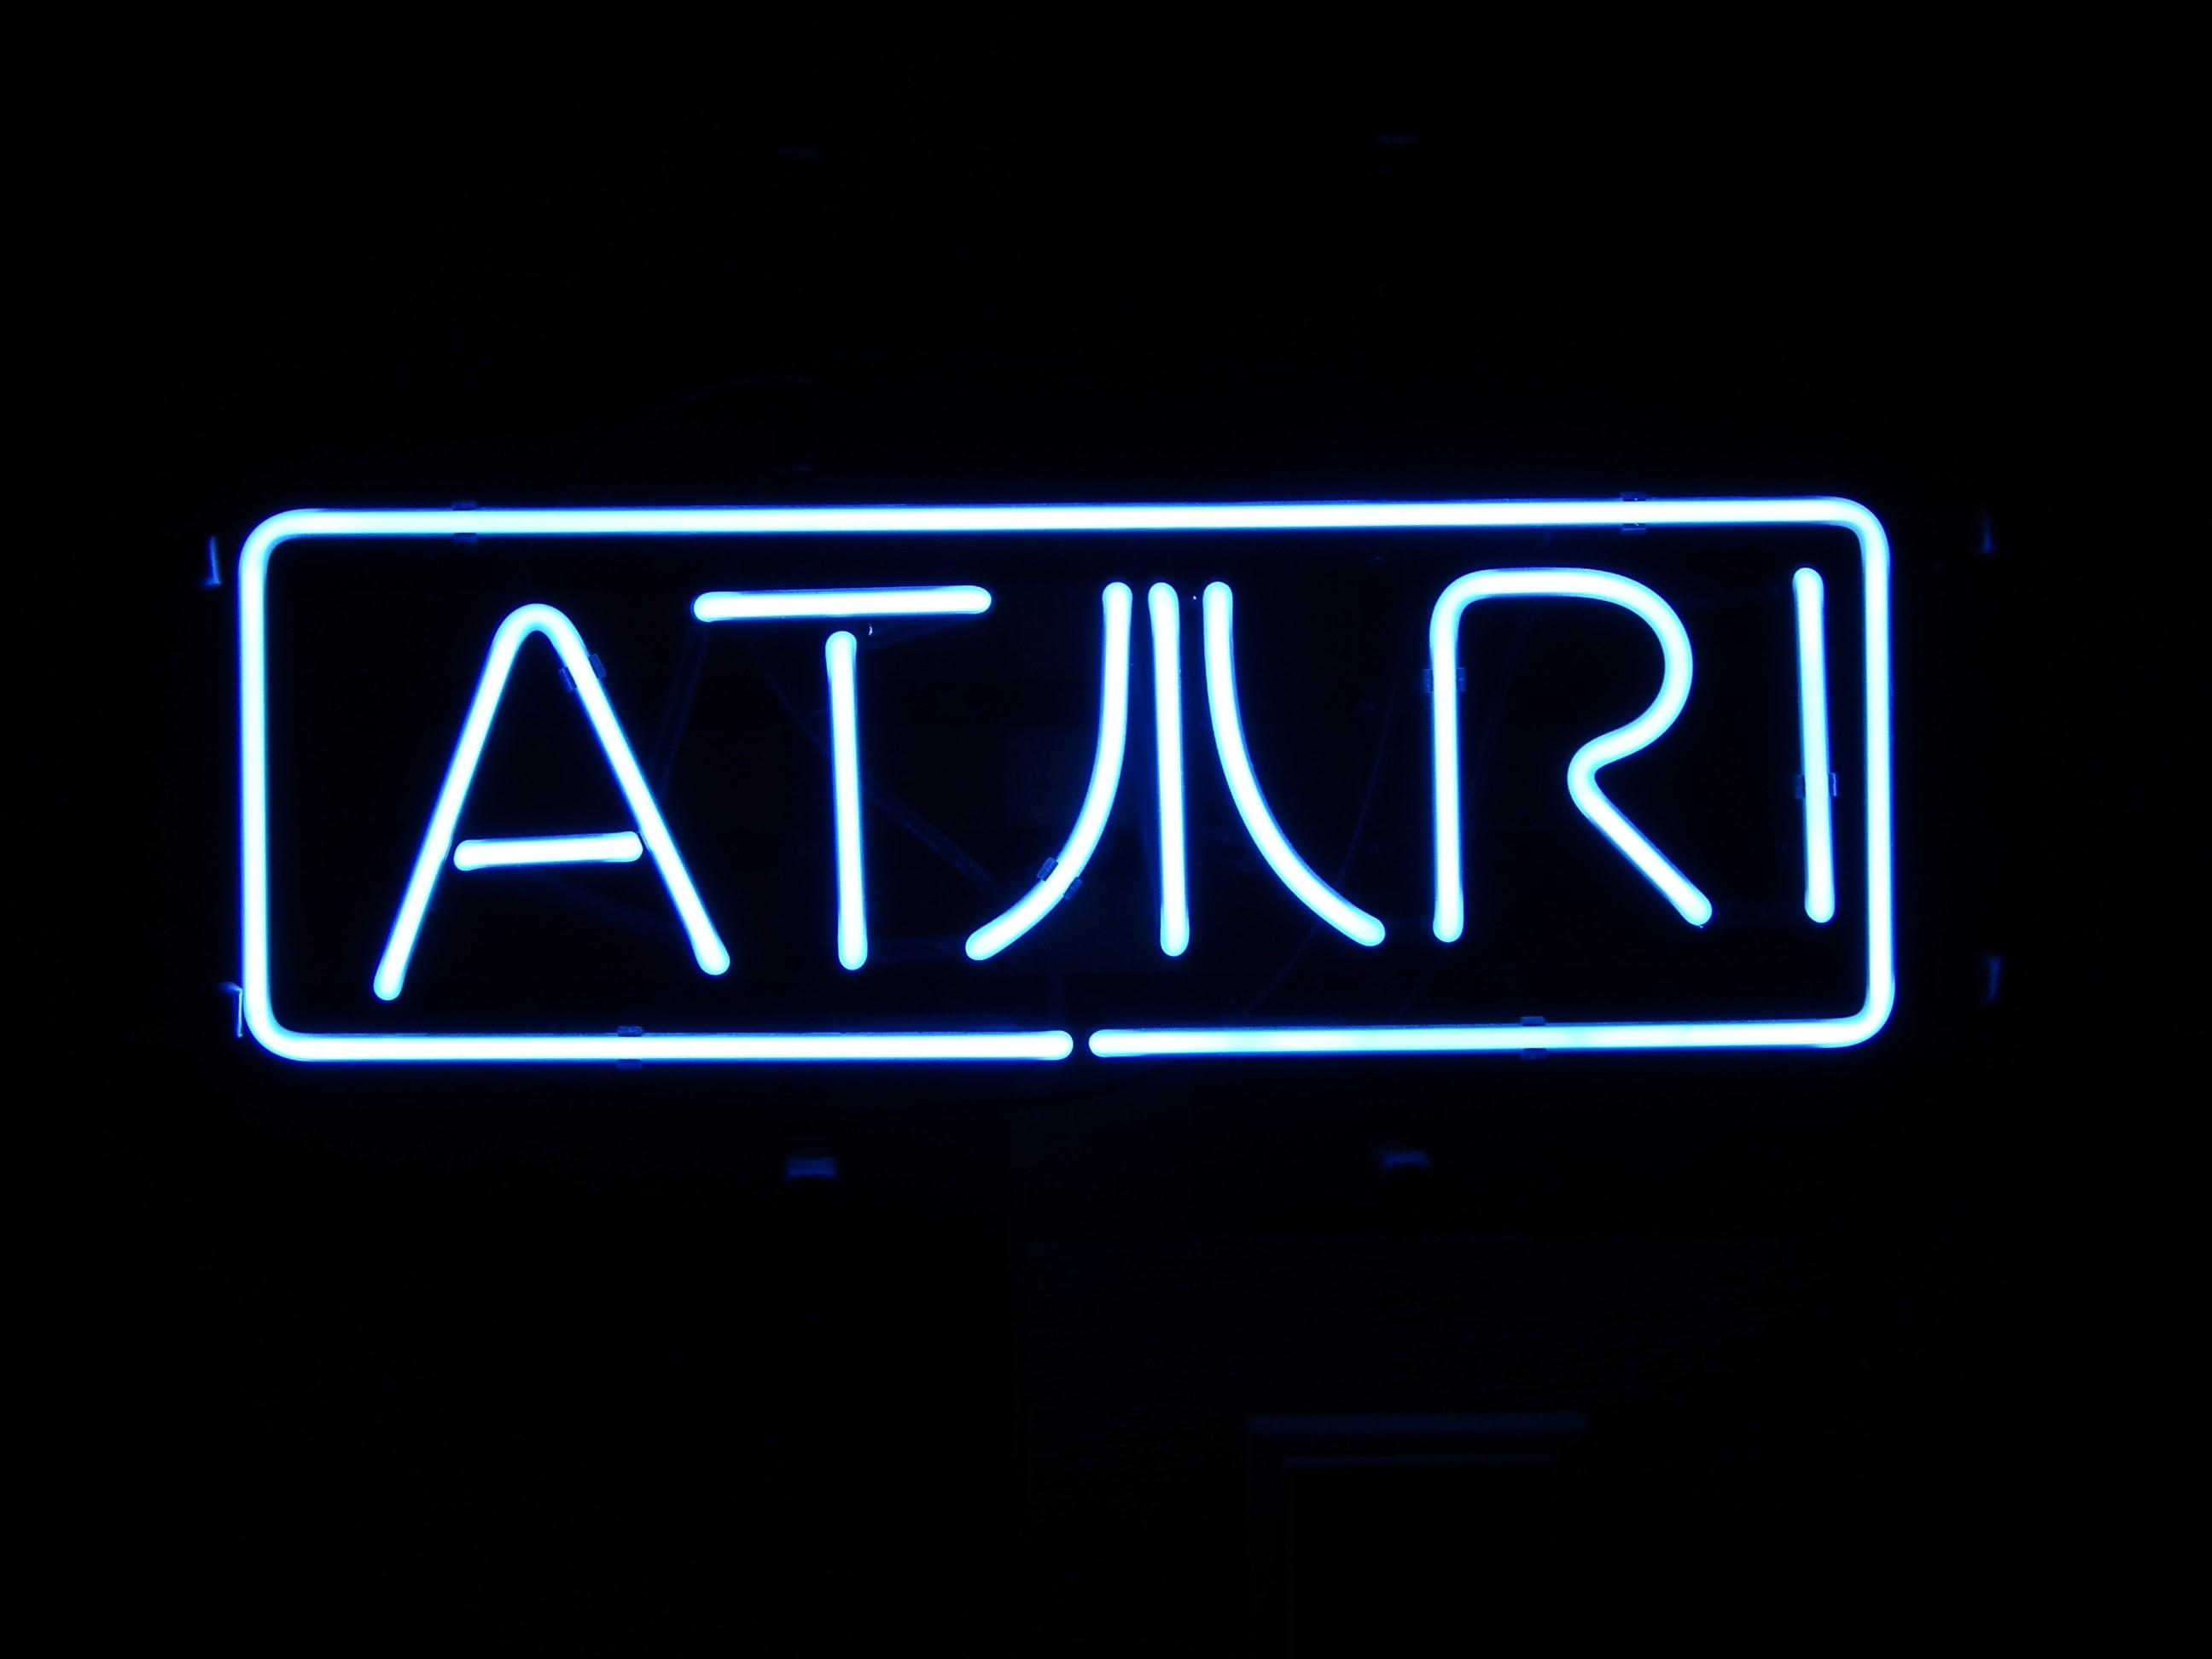 Res: 2592x1944, Atari neon sign